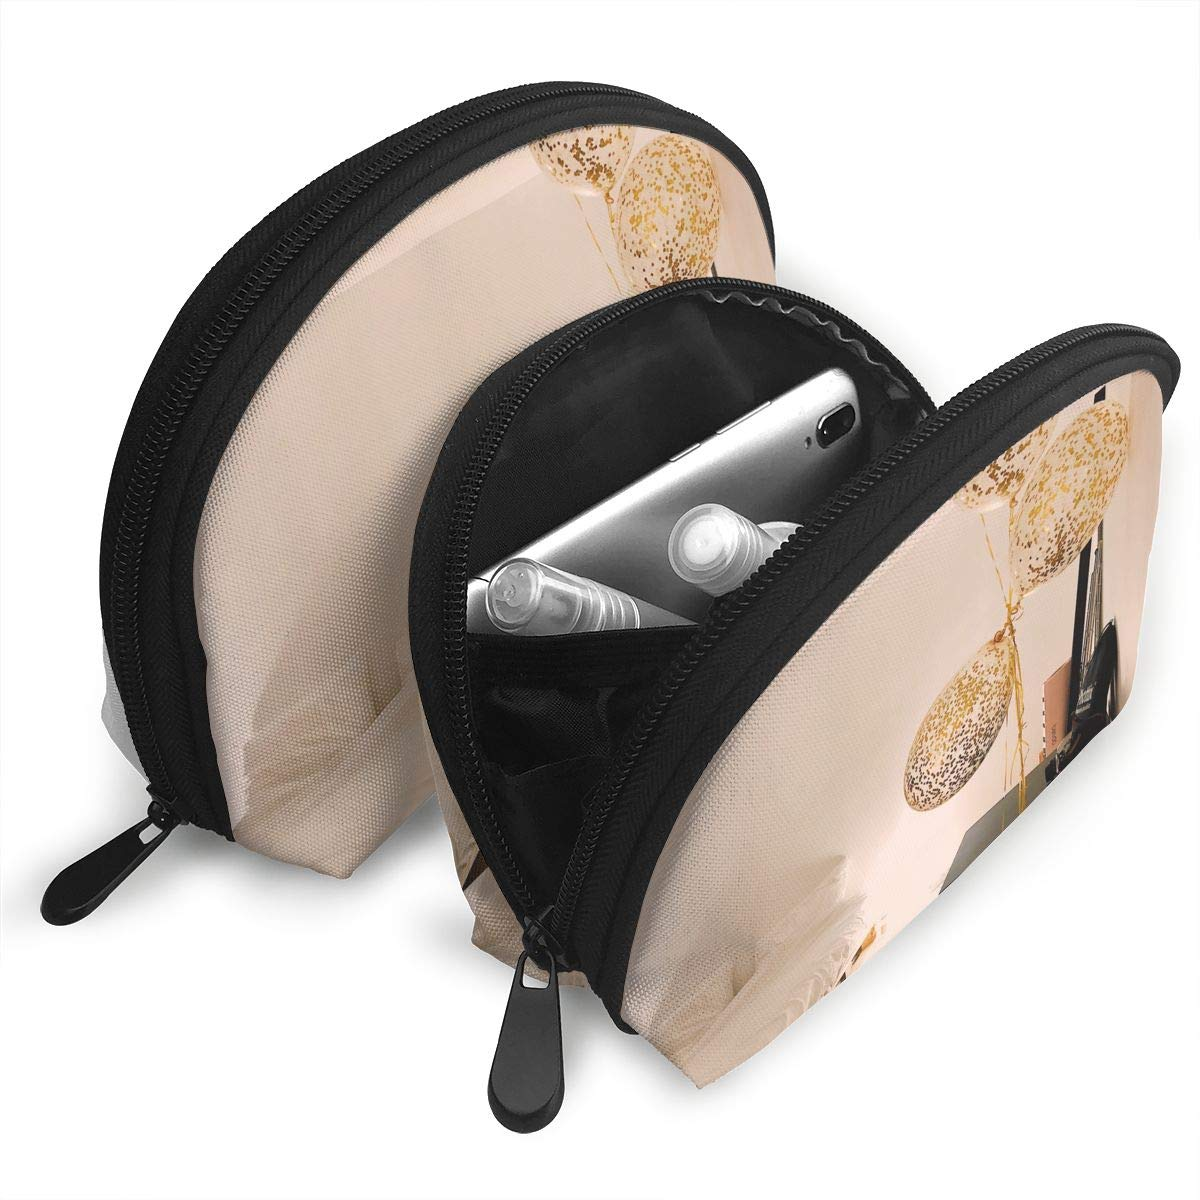 HJDKFIW Personalized Braided Lamp Womens Shell Shape Carrying Case Organizer Bag Gift 2Pcs